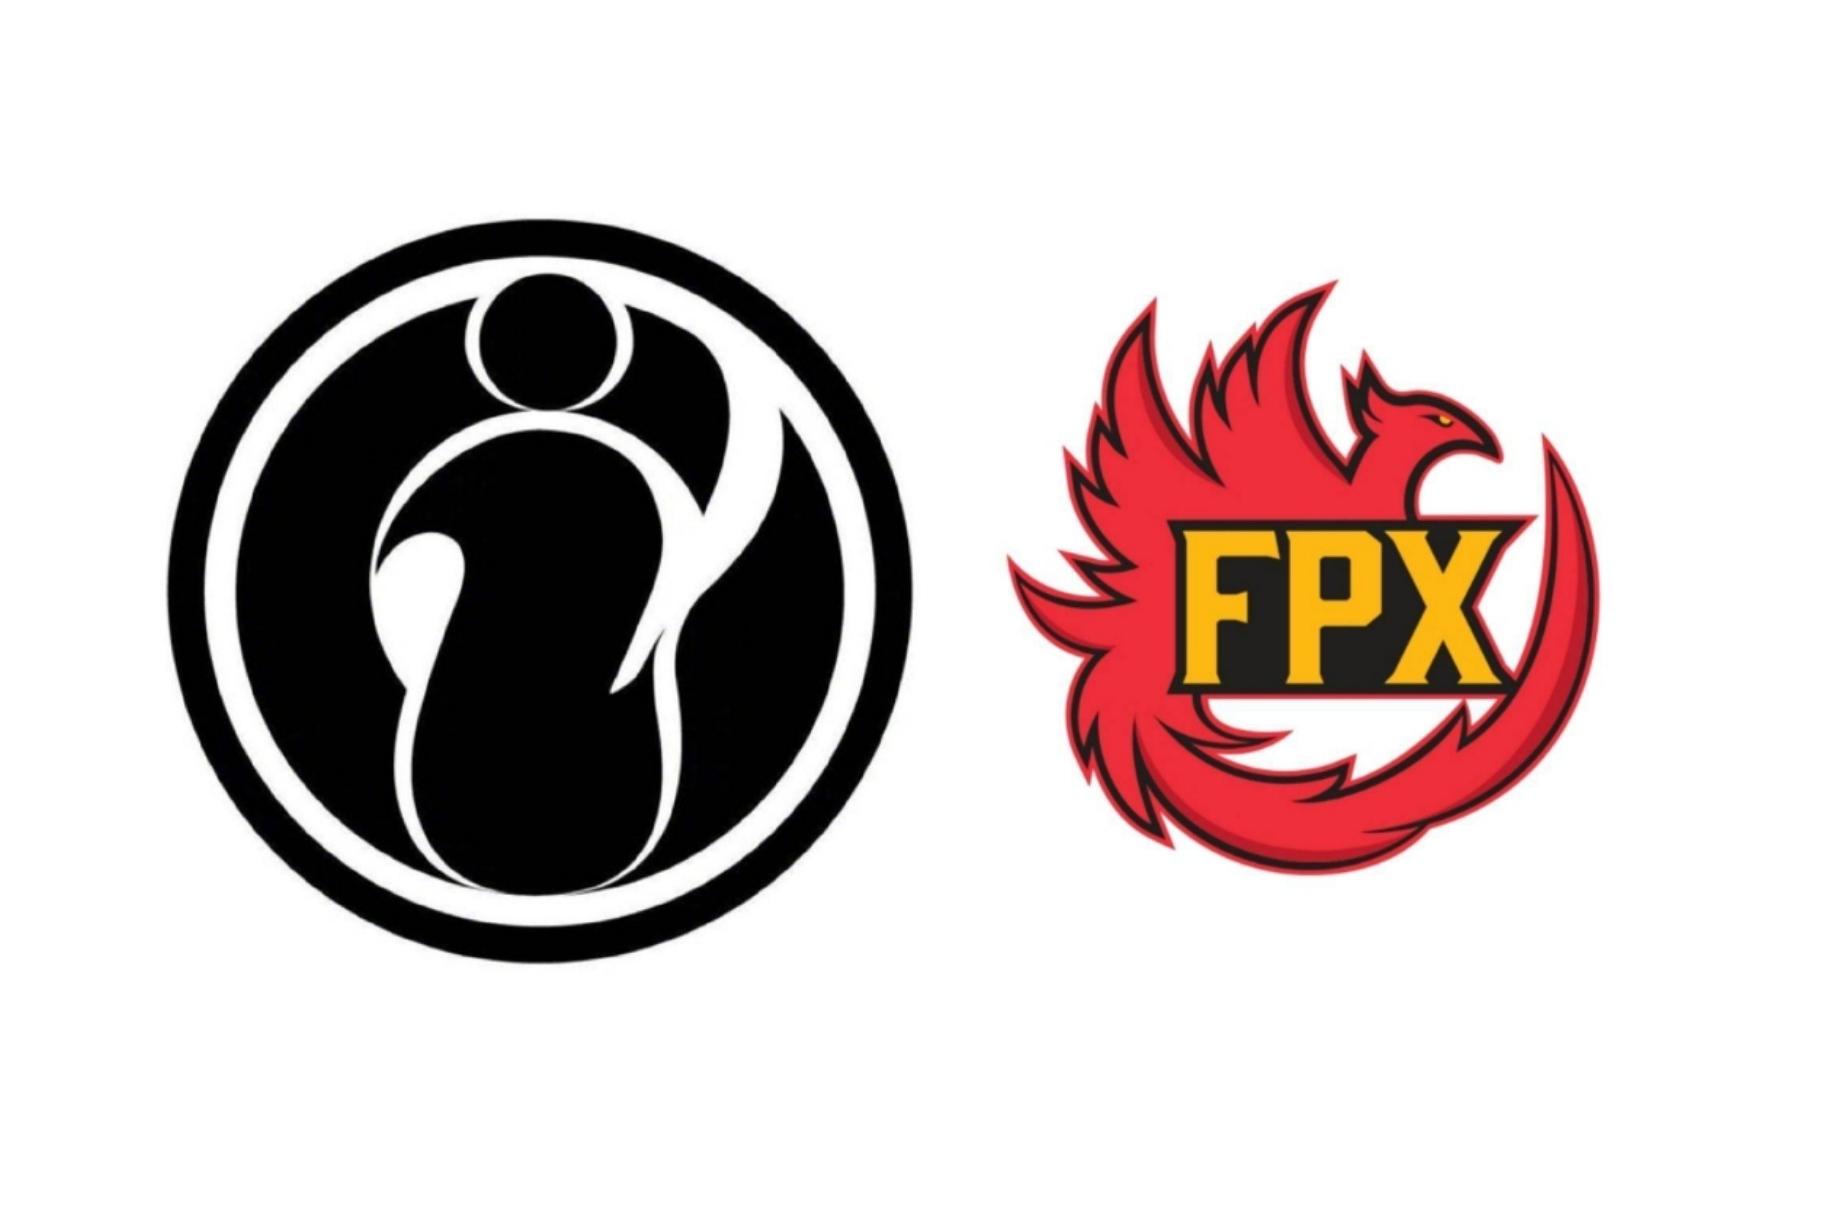 IGVS FPX|两个世界冠军的最后一场斗争,谁会保留晋升的希望?